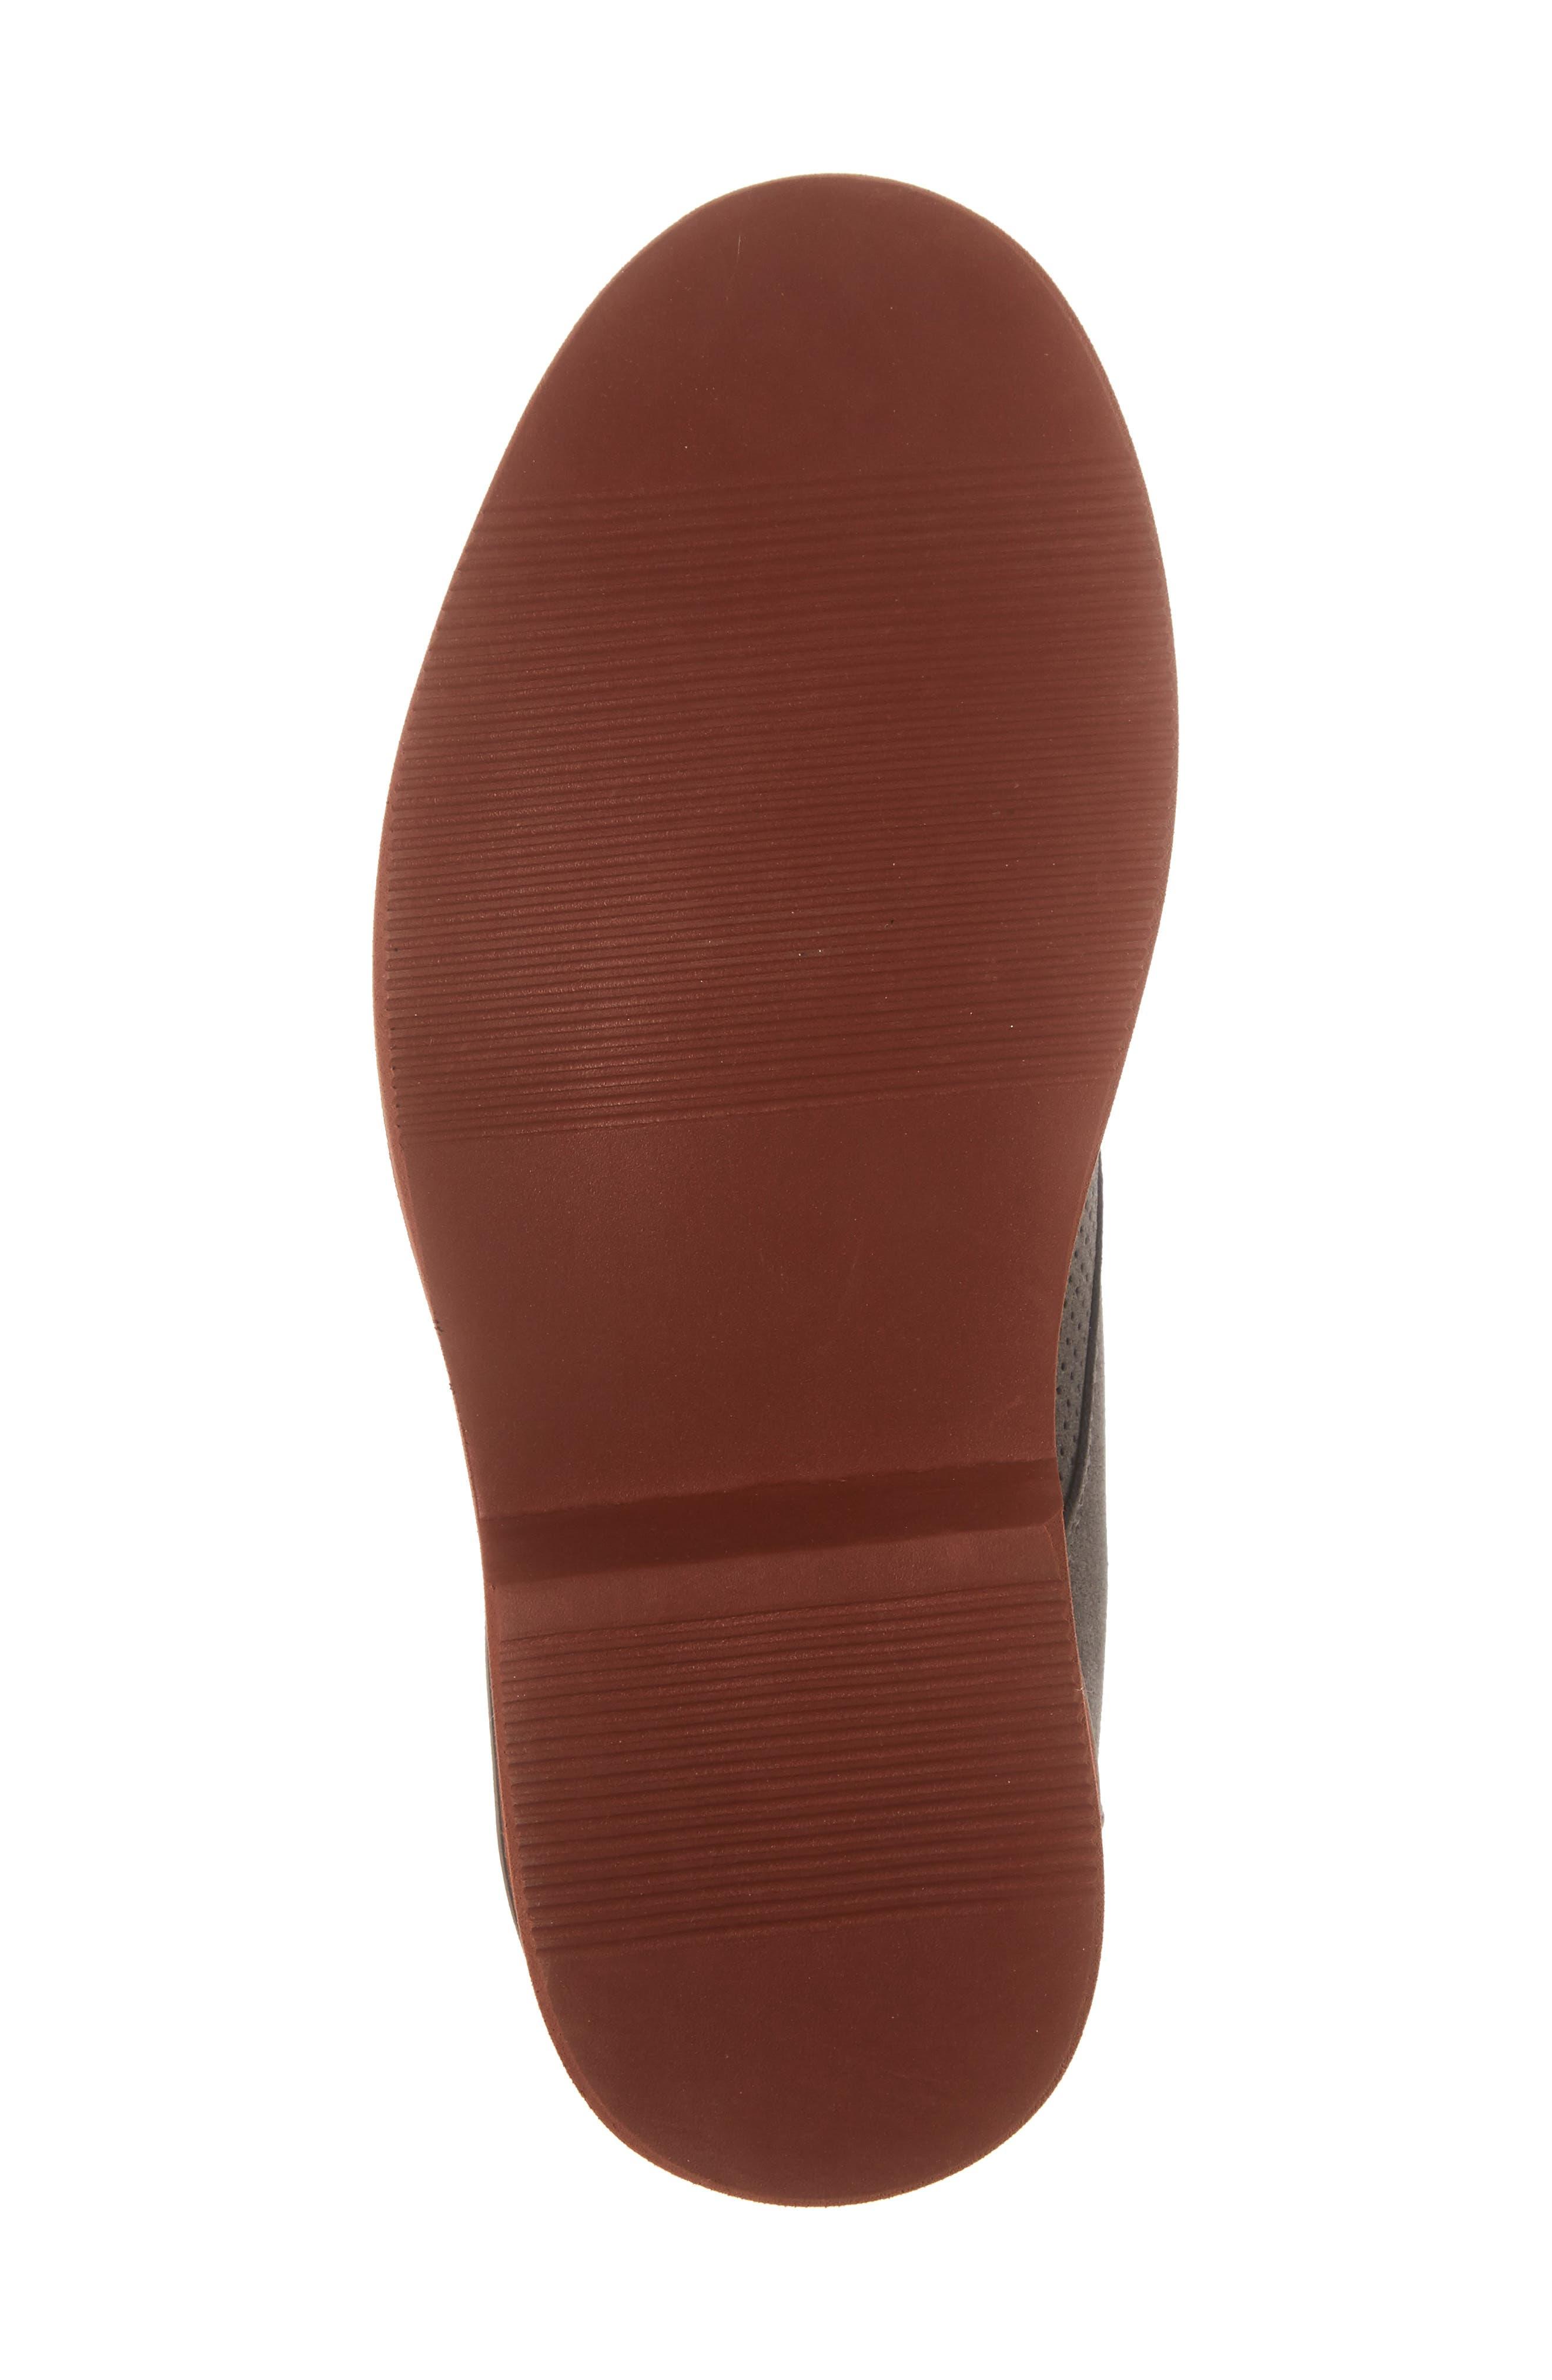 Baden Perforated Chukka Shoe,                             Alternate thumbnail 6, color,                             055